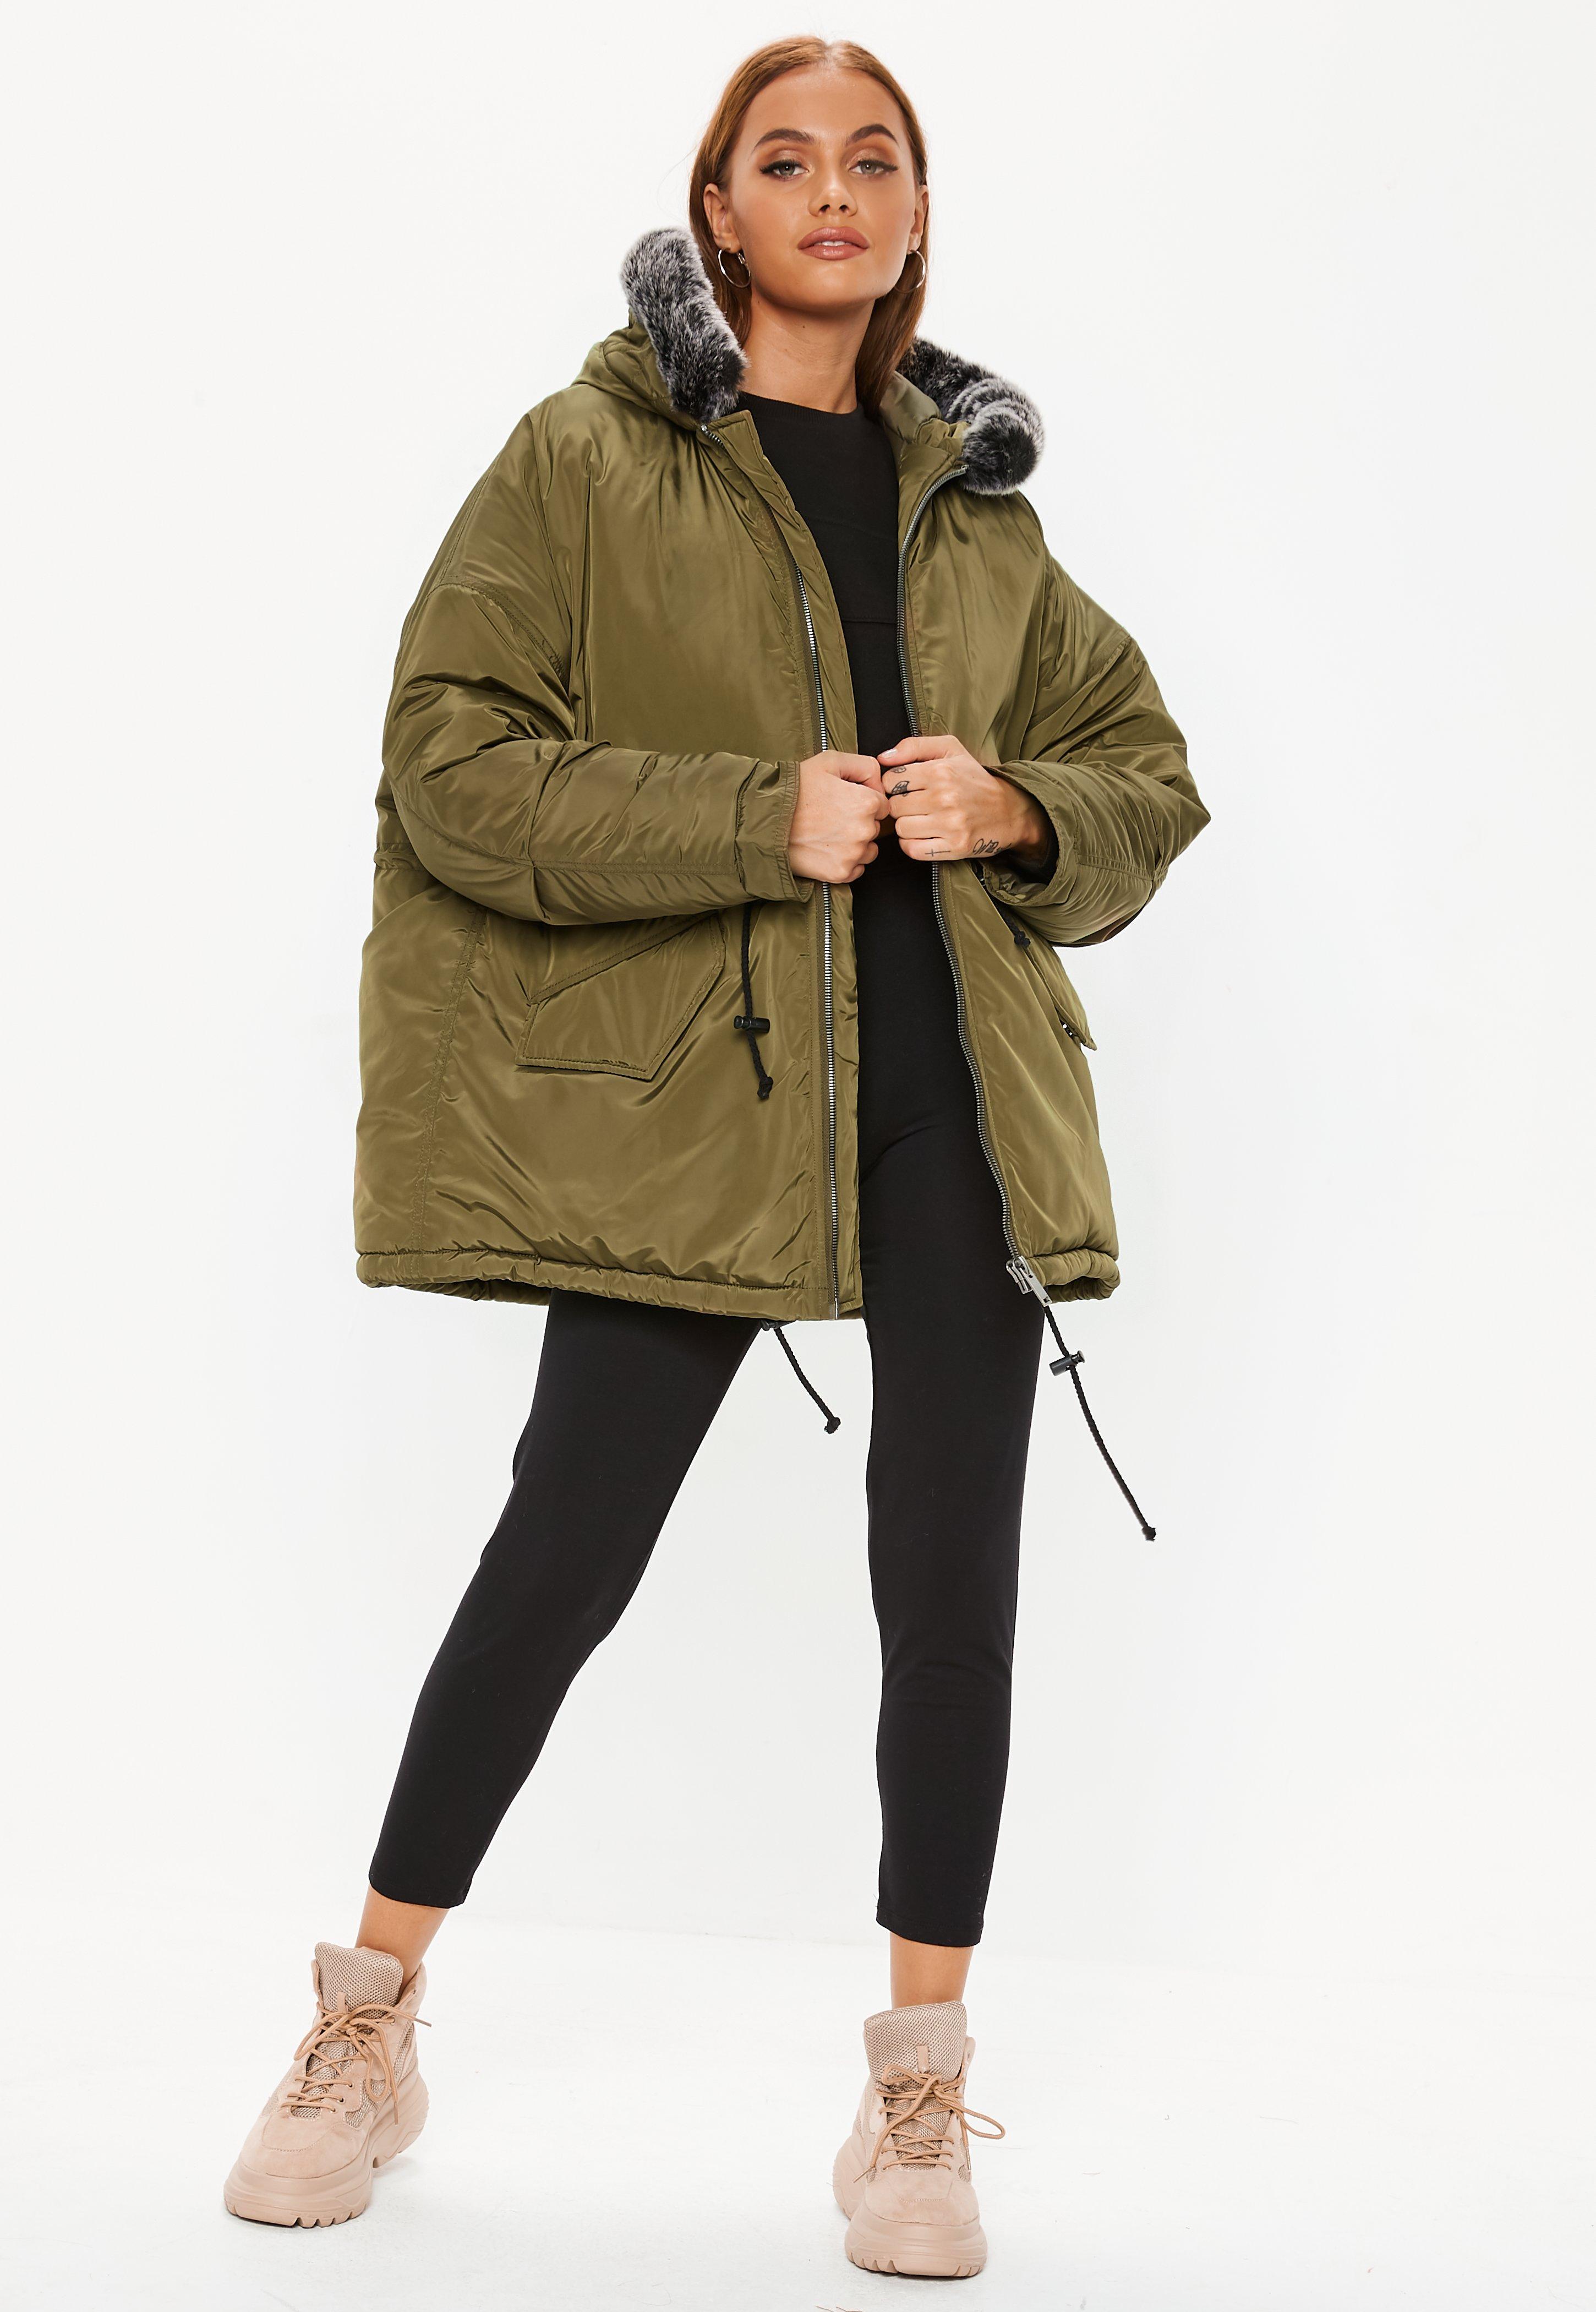 a702a5fcf0b04 Women Coats Sale   Cheap Coats UK - Missguided